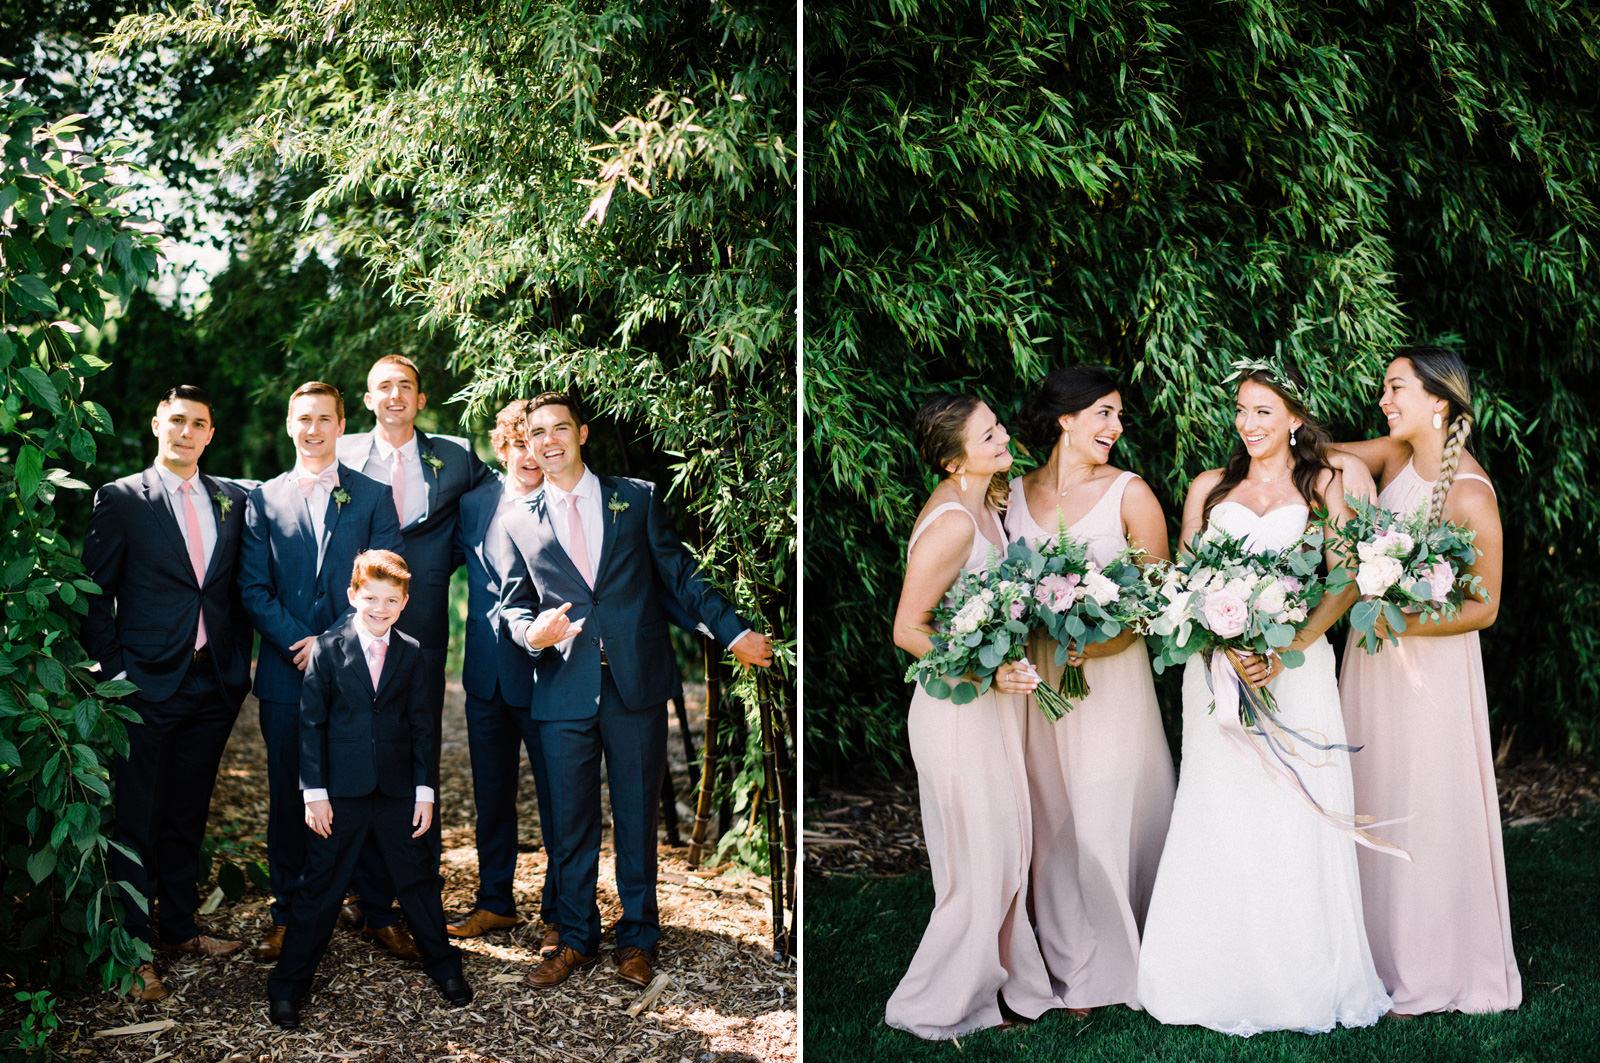 031-woodinville-lavendar-farm-wedding-with-golden-glowy-photos.jpg